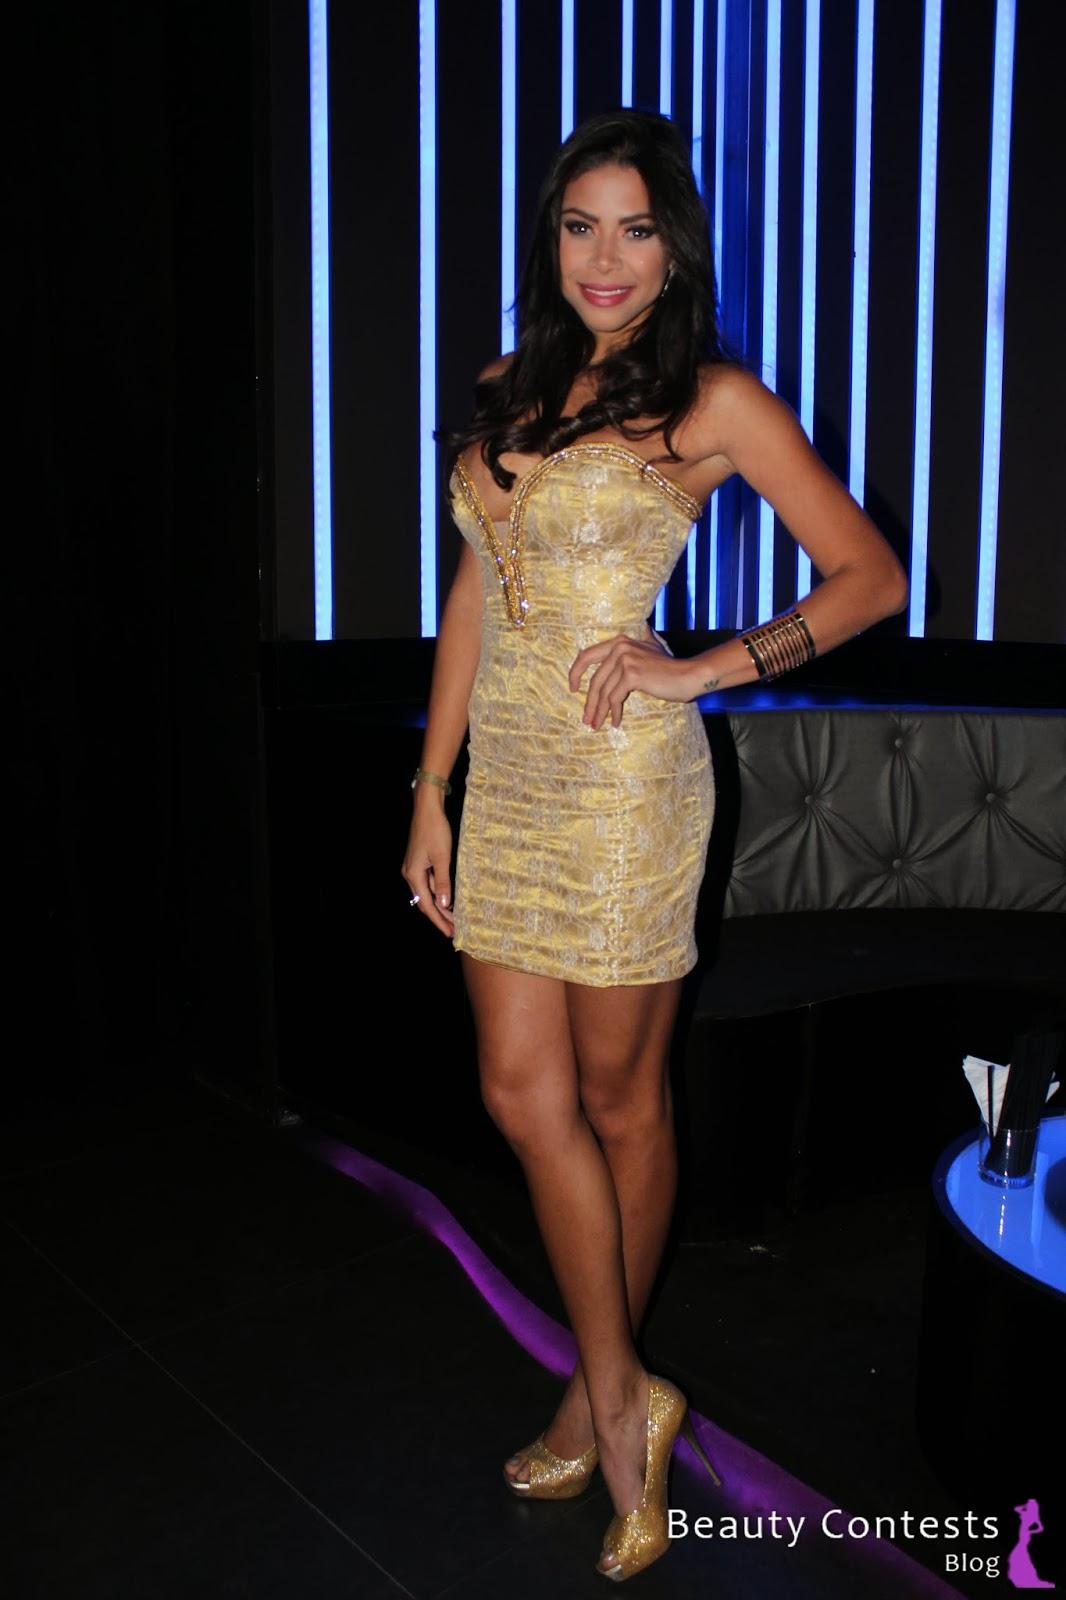 camila serakides, miss continentee americano 2012. - Página 2 3927hvhu